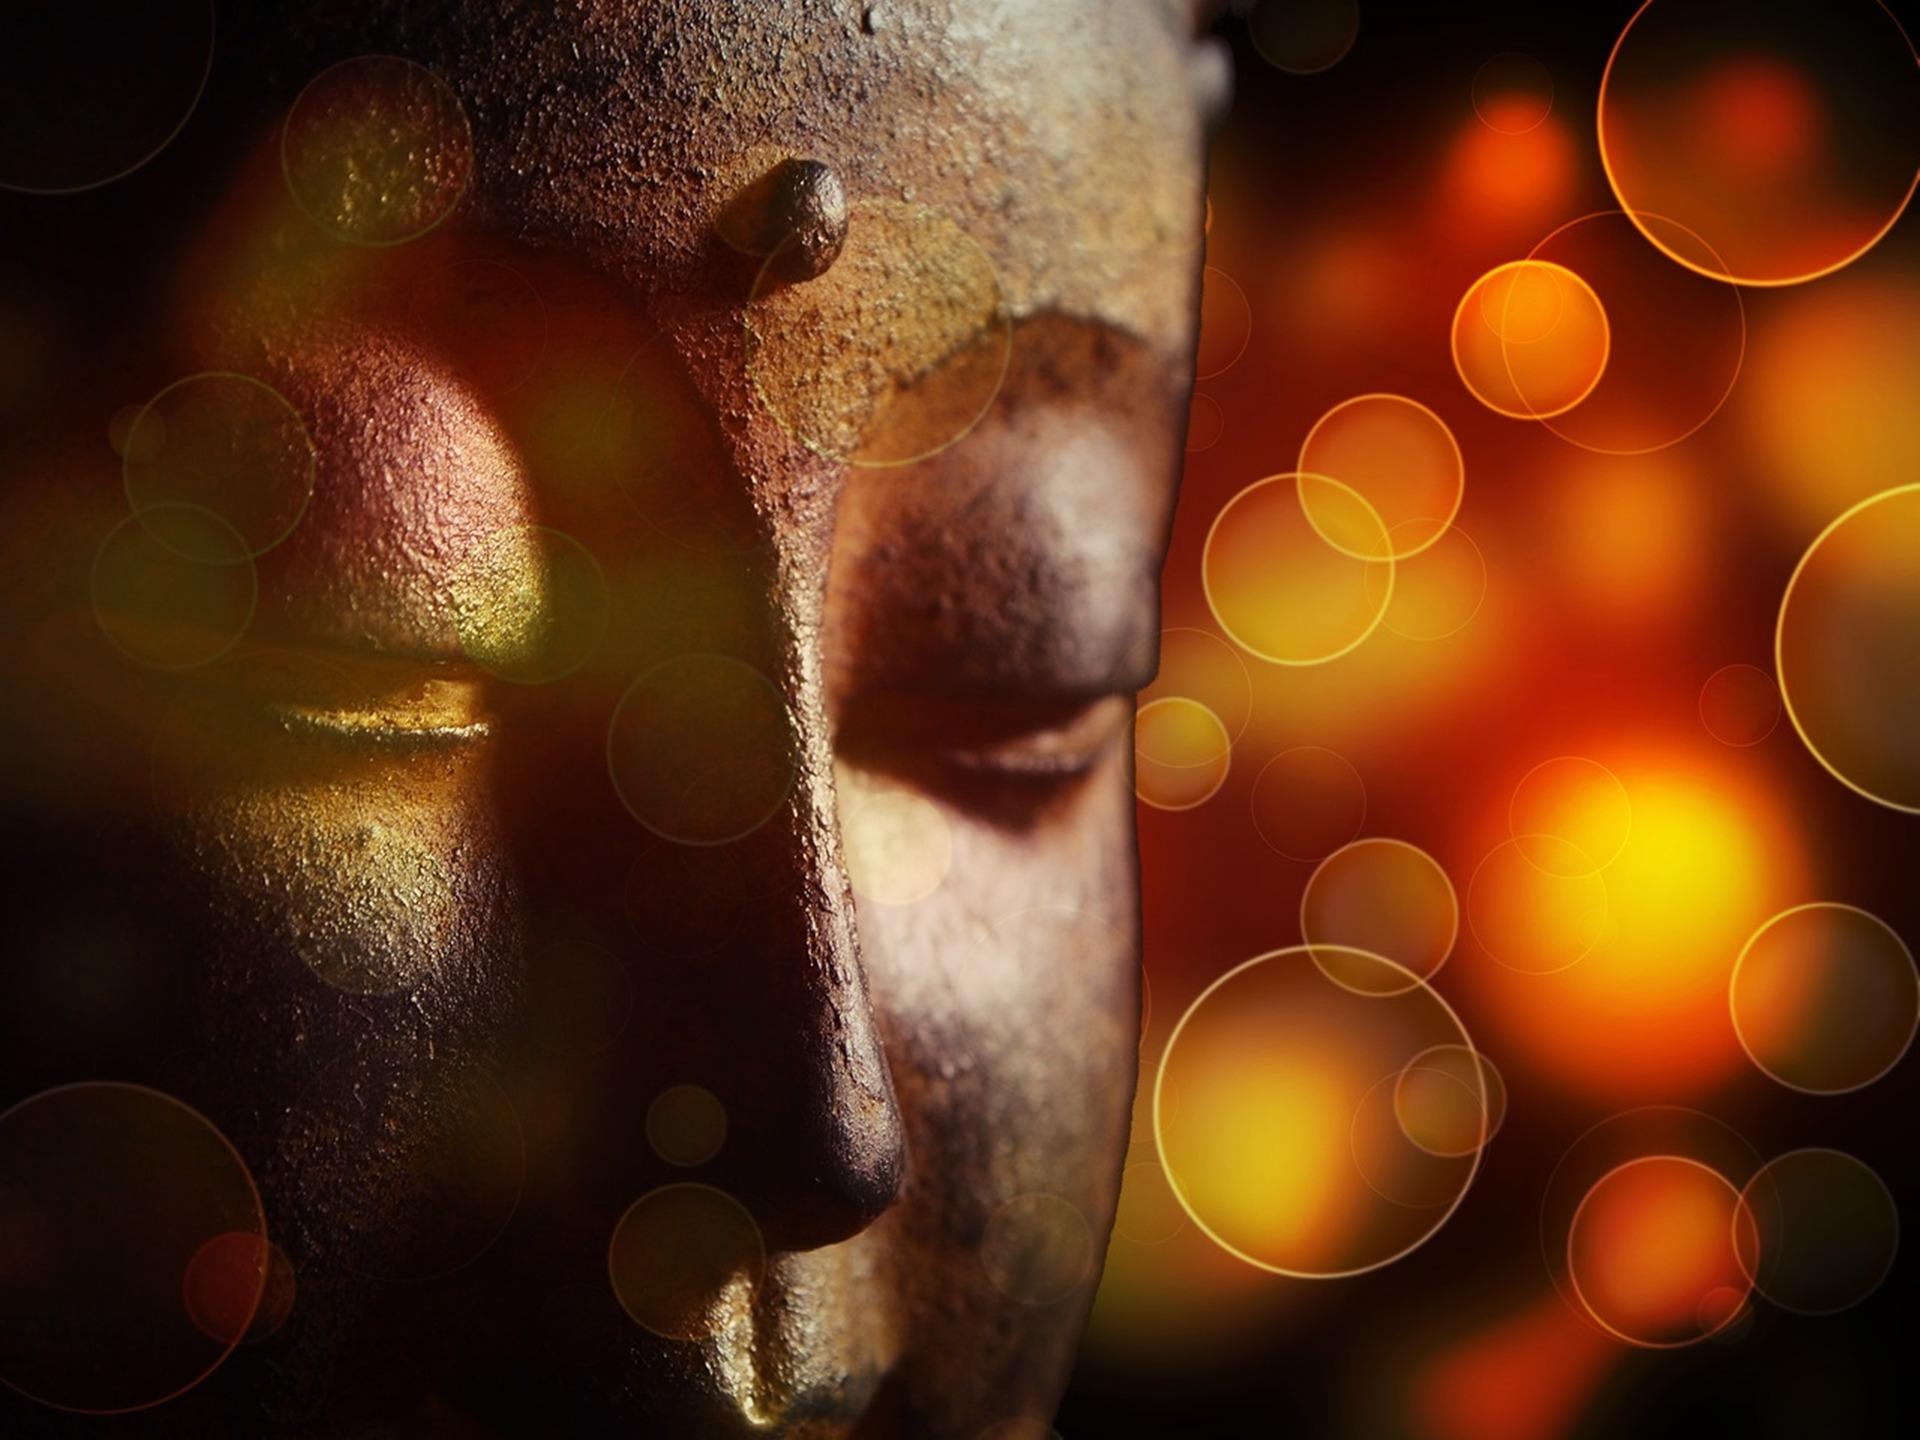 buddha-1915589_1920.jpg